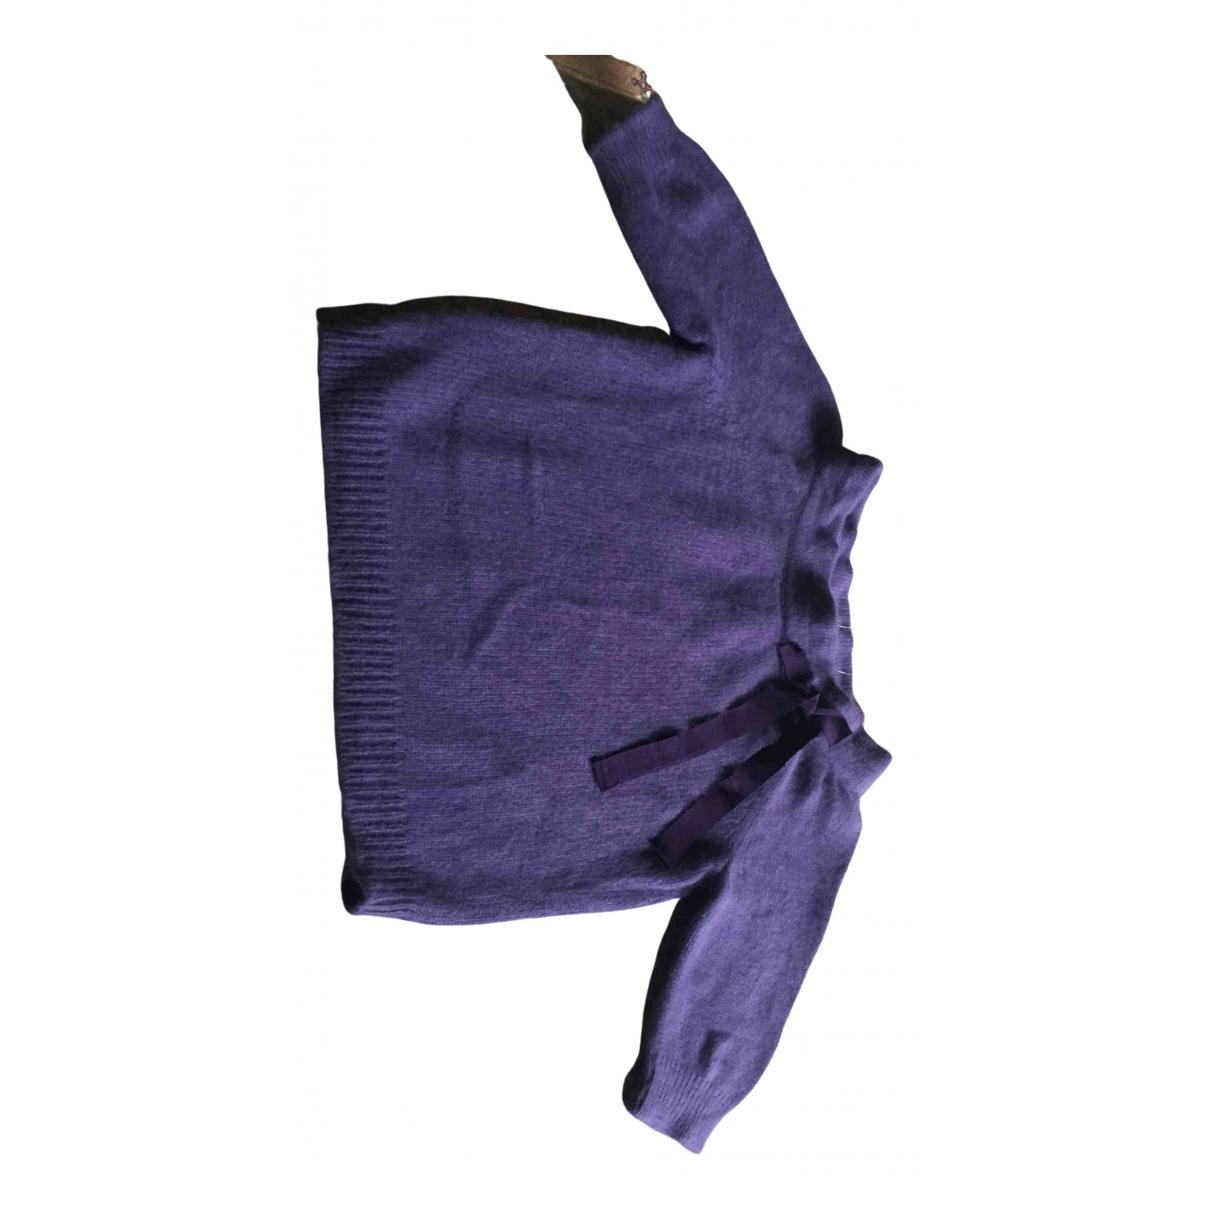 Moschino Cheap And Chic \N Purple Wool Knitwear for Women M International